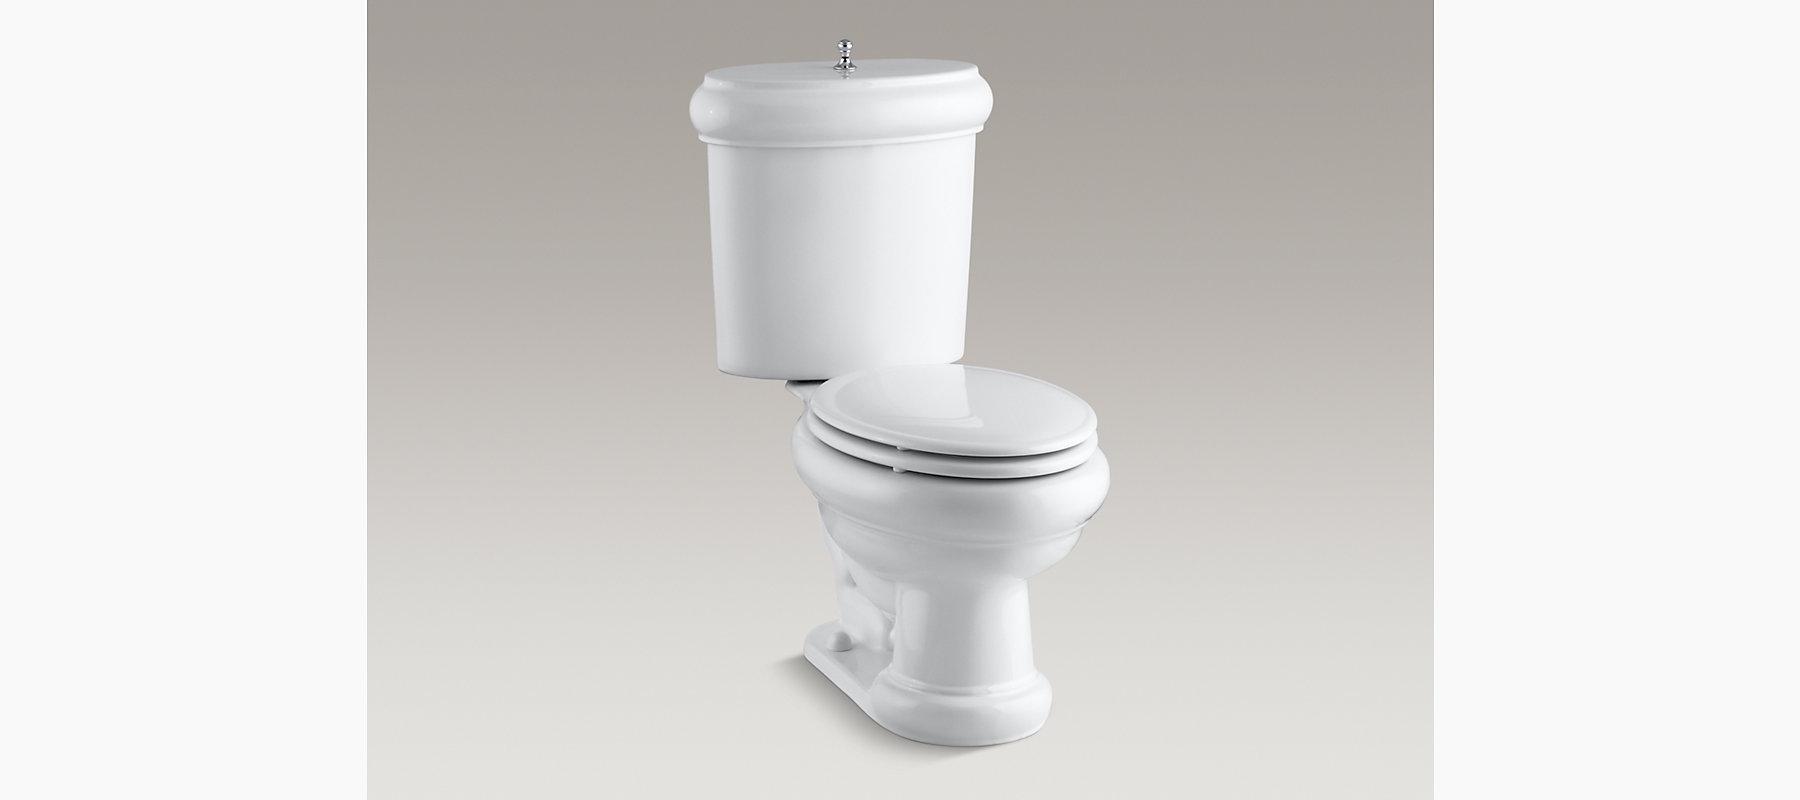 Kohler K 3555 Revival Two Piece Elongated 1 6 Gpf Toilet